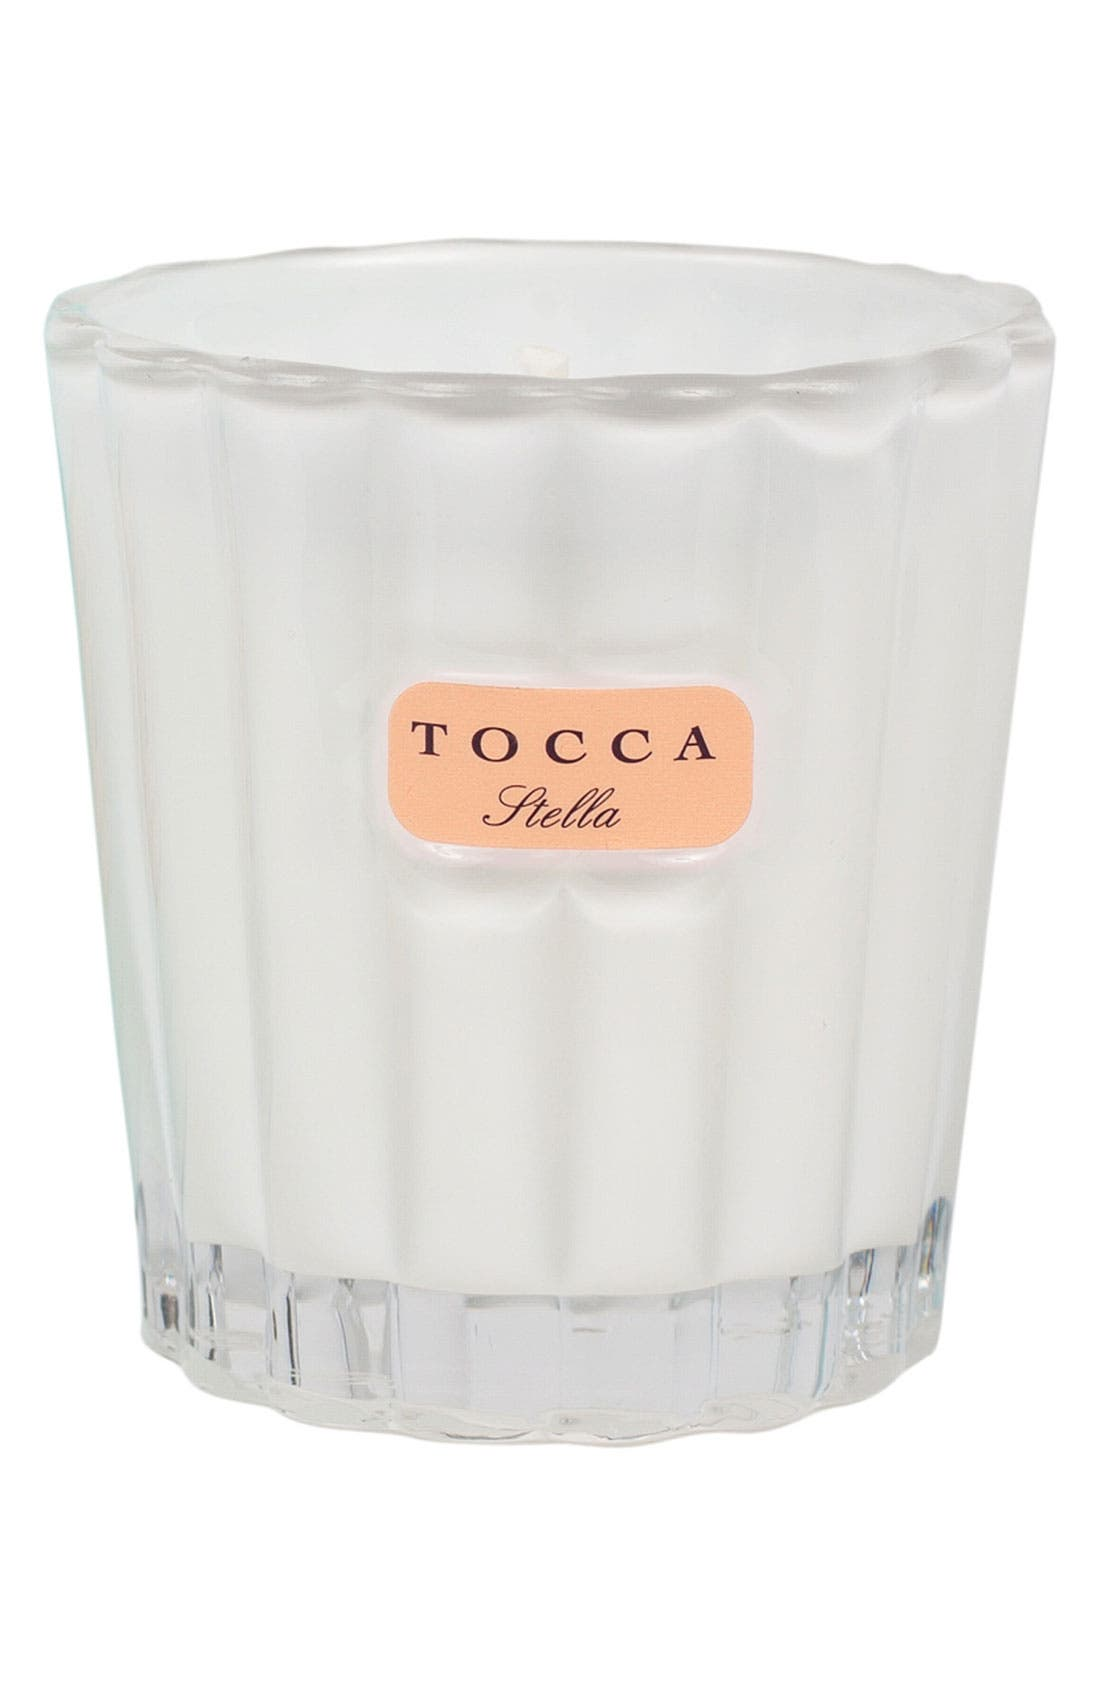 TOCCA 'Stella' Candelina